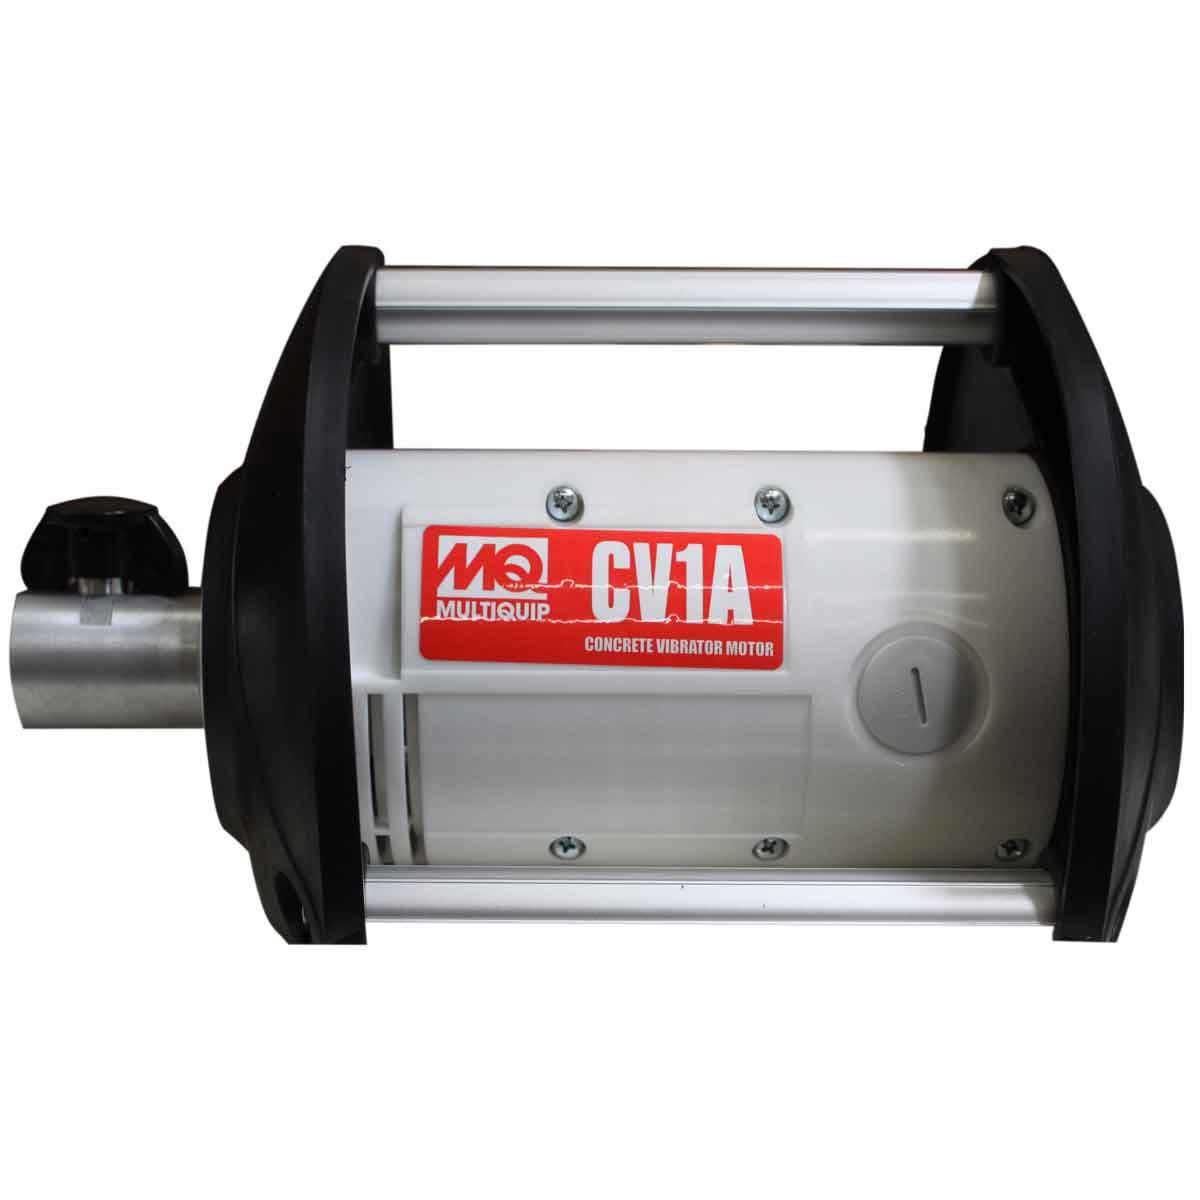 CV1A Multiquip Concrete vibrator